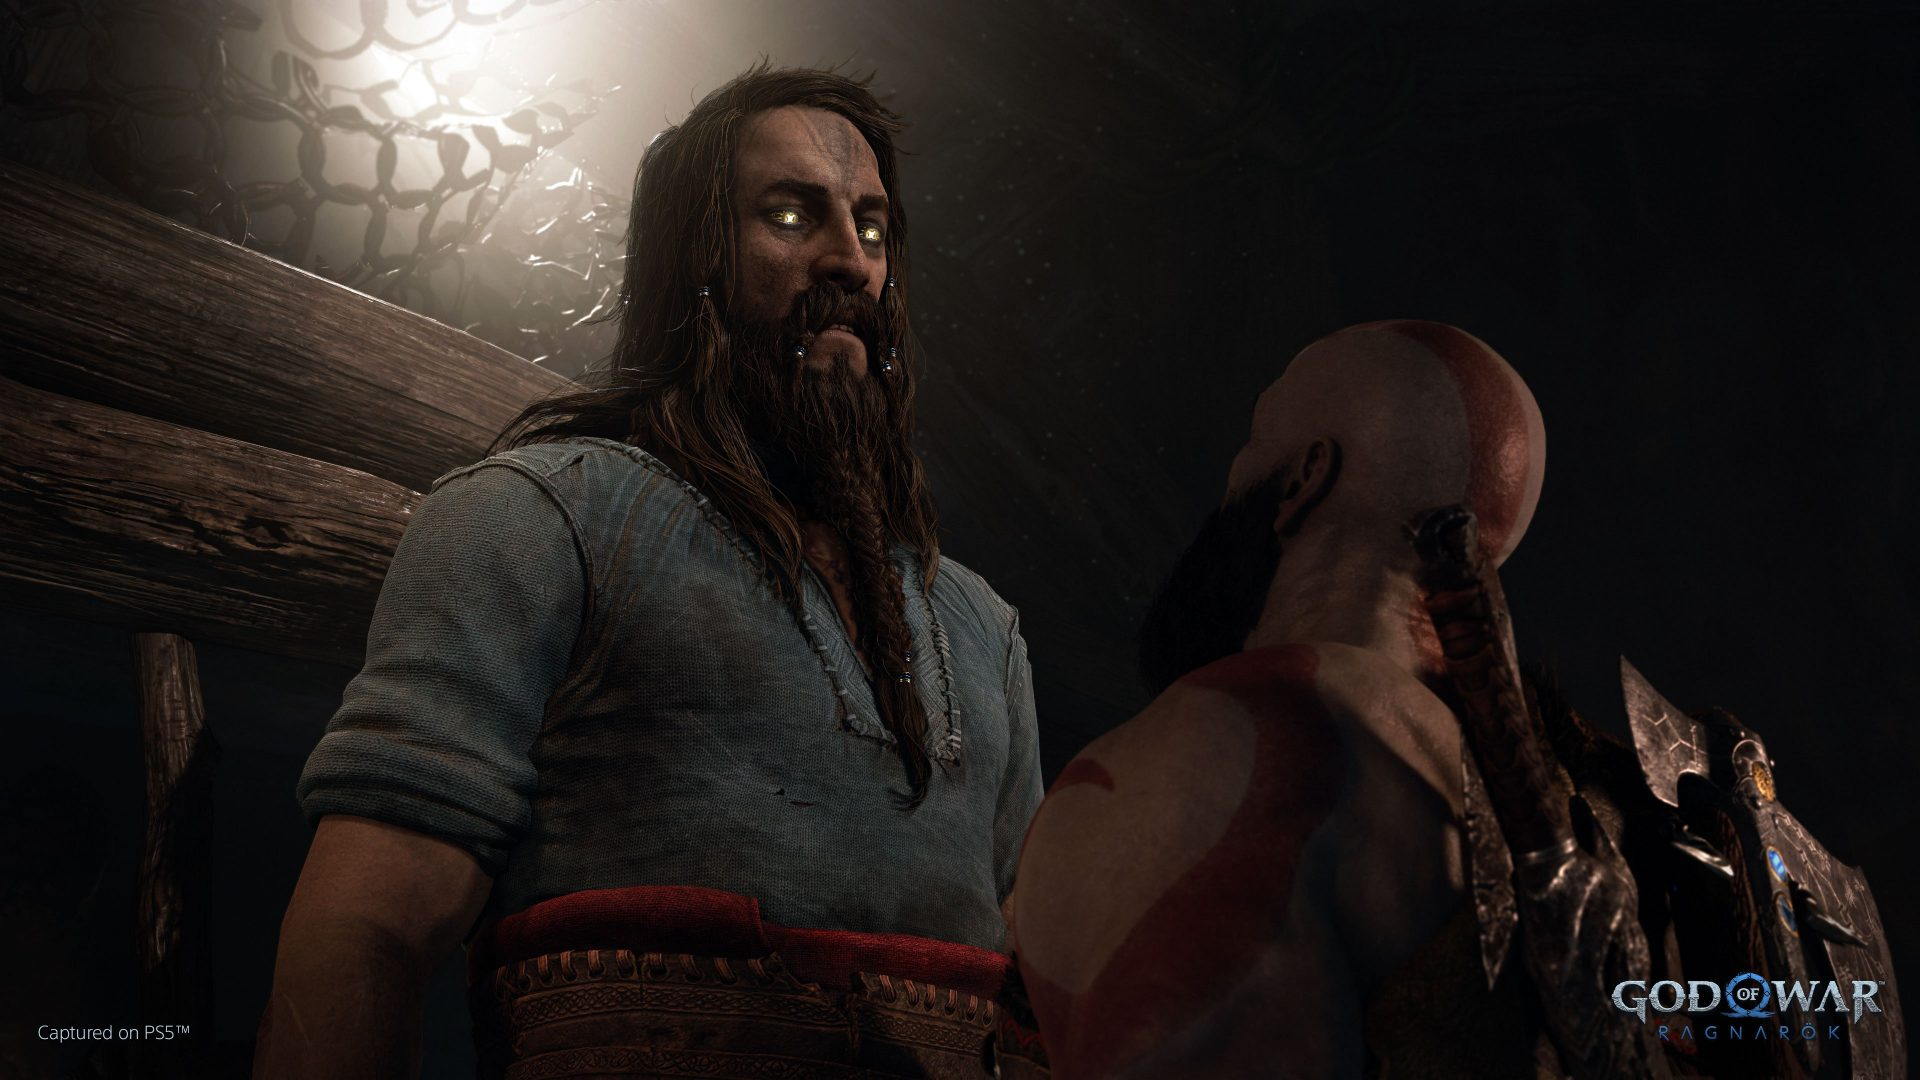 God of War Ragnarok sarà l'ultimo capitolo della saga norrena